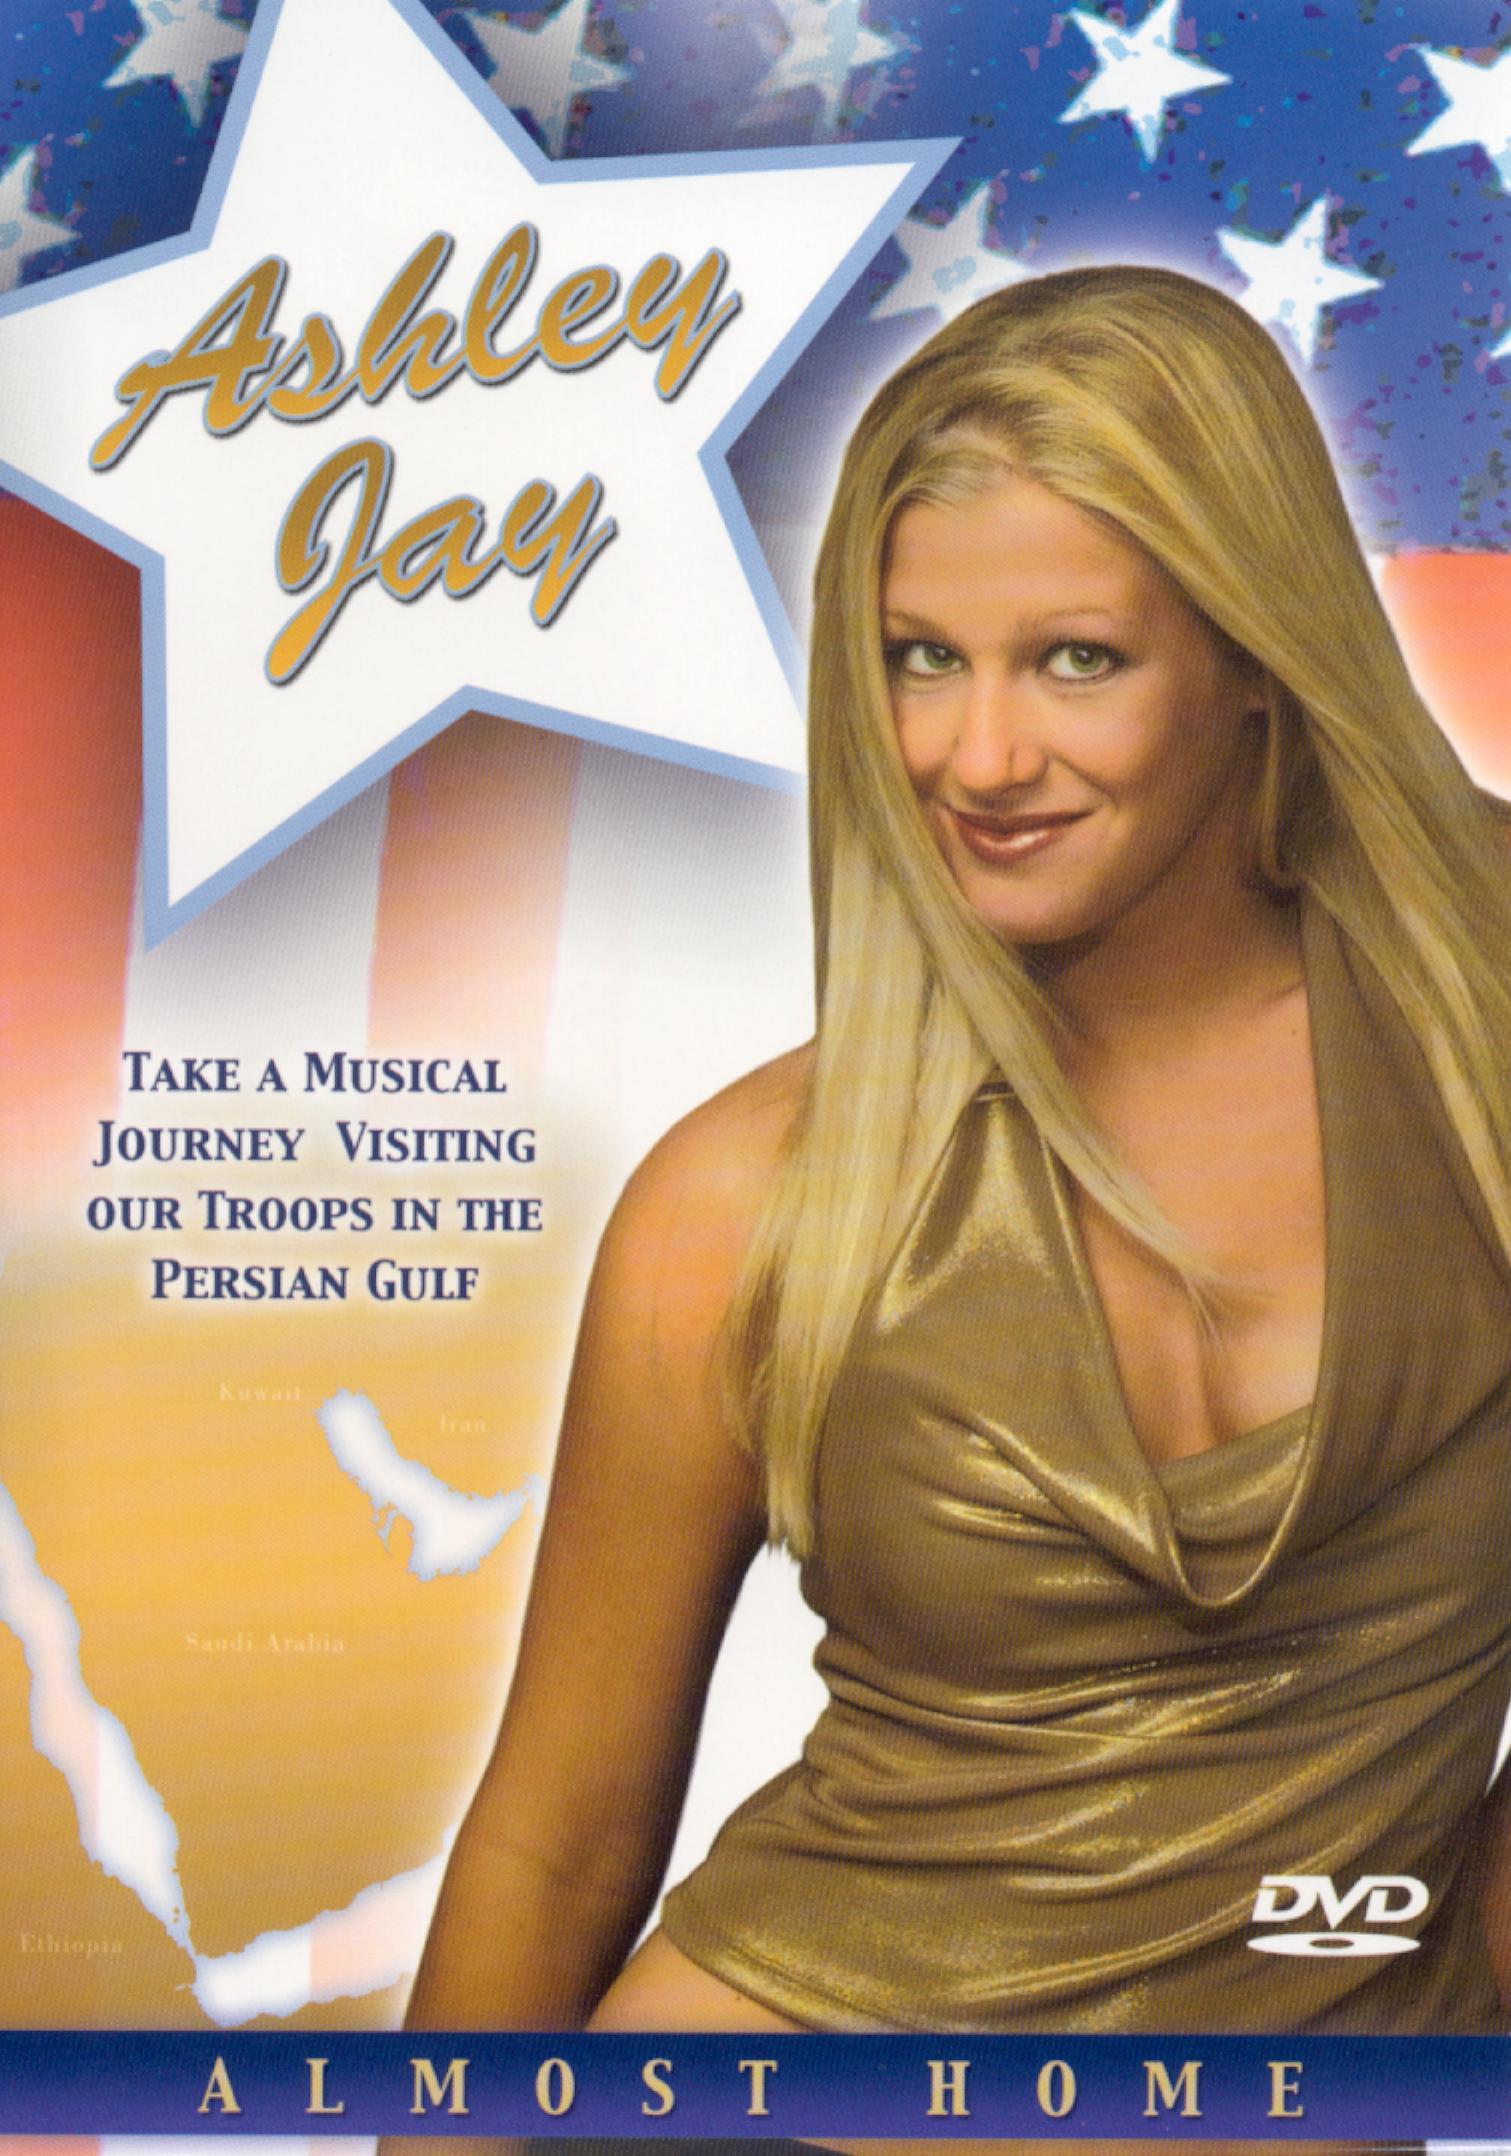 Ashley Jay